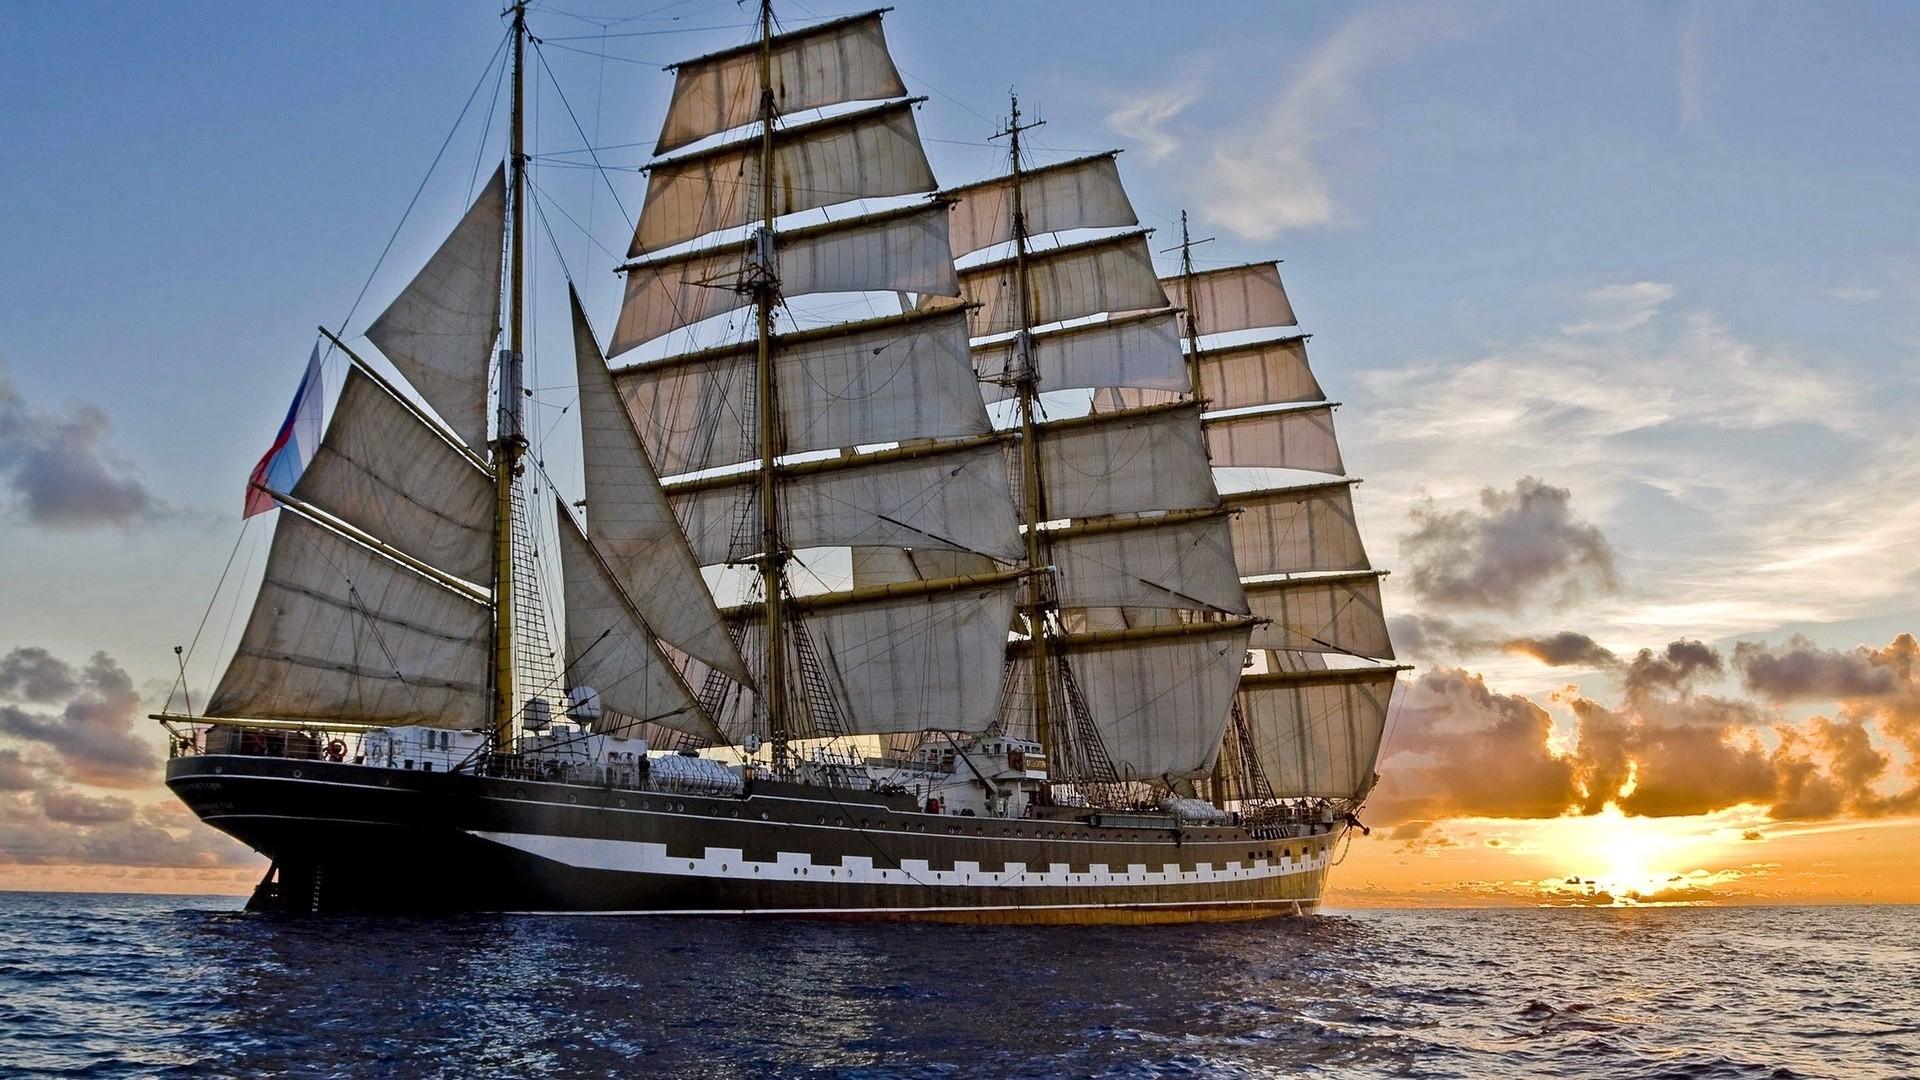 General 1920x1080 ship sea vintage sunset